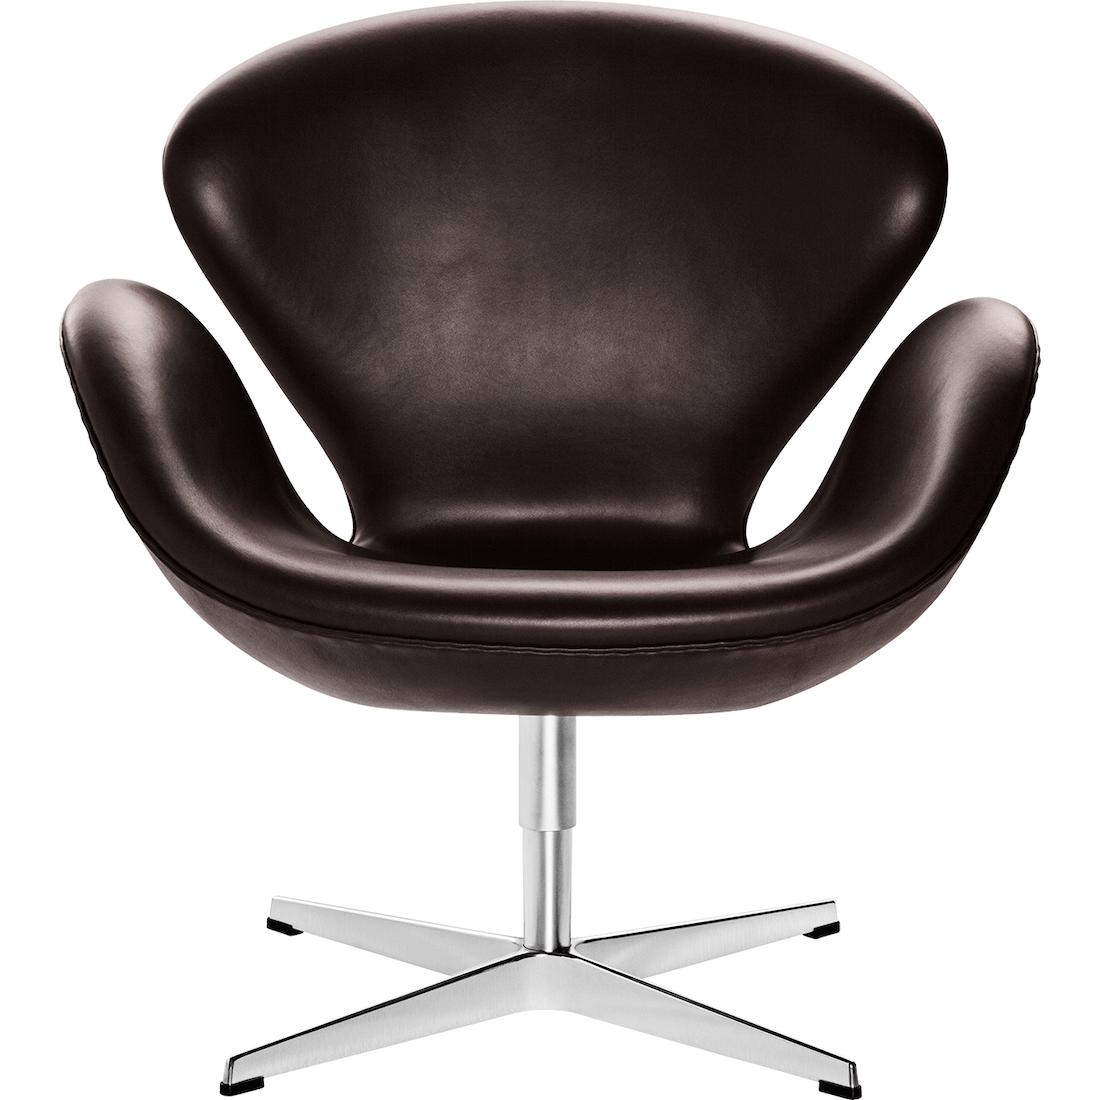 Fritz Hansen Svanen lænestol - Model 3320 - Læder, Grace læder, dark brown, Timm Møbler